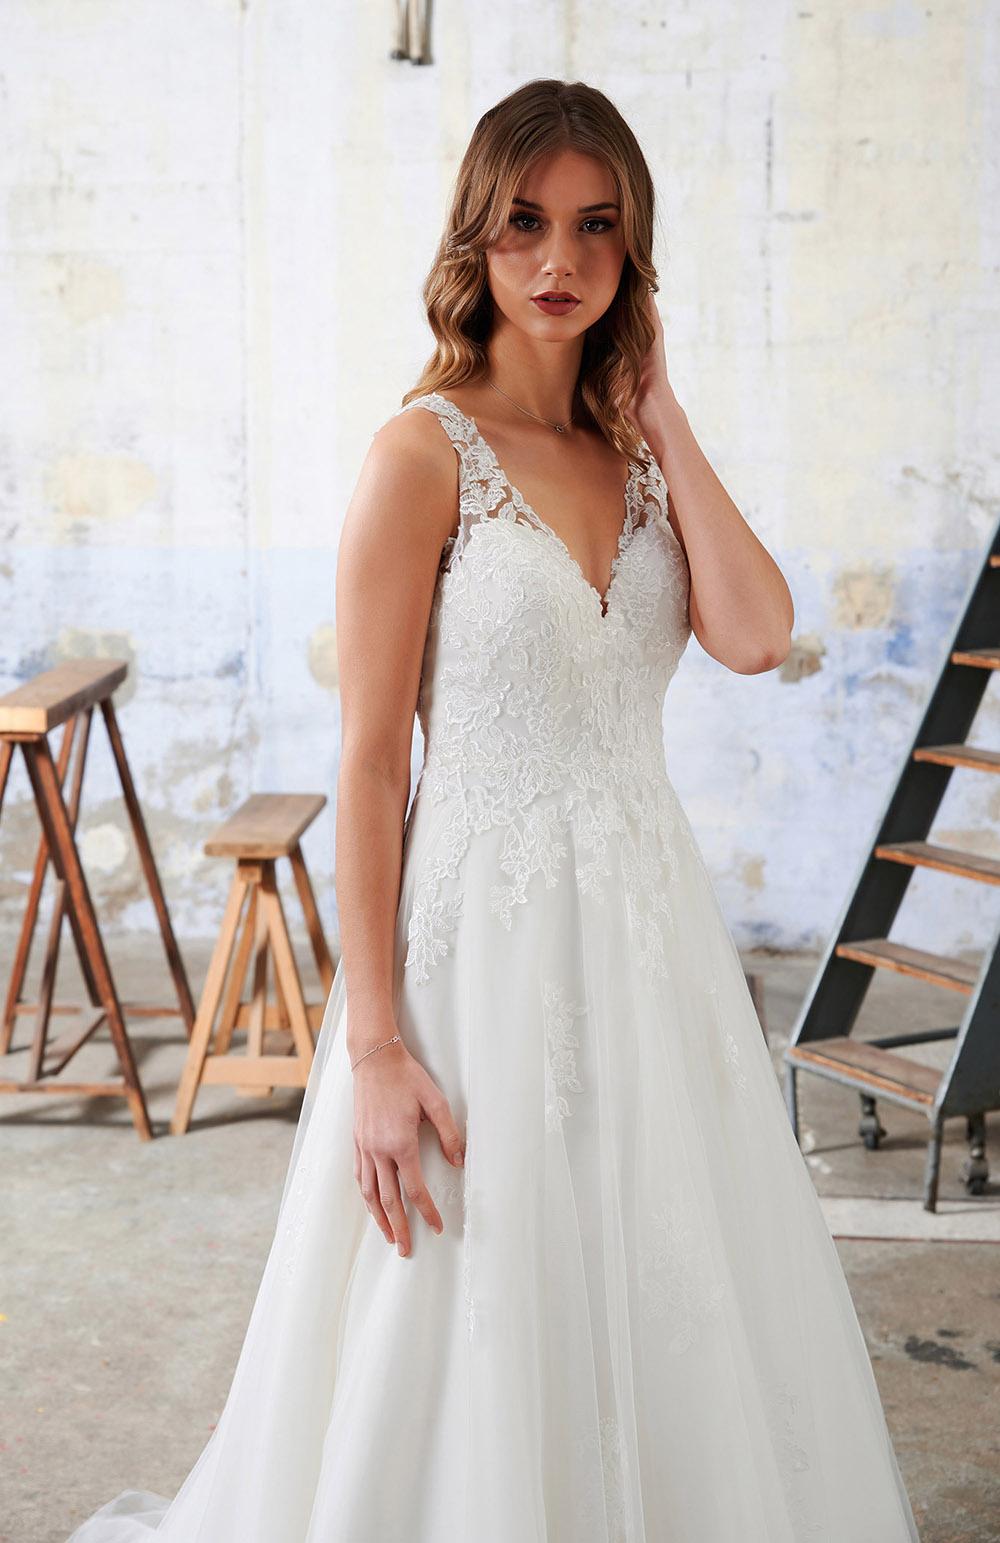 Robes de mariée Atelier Nuptial 2022